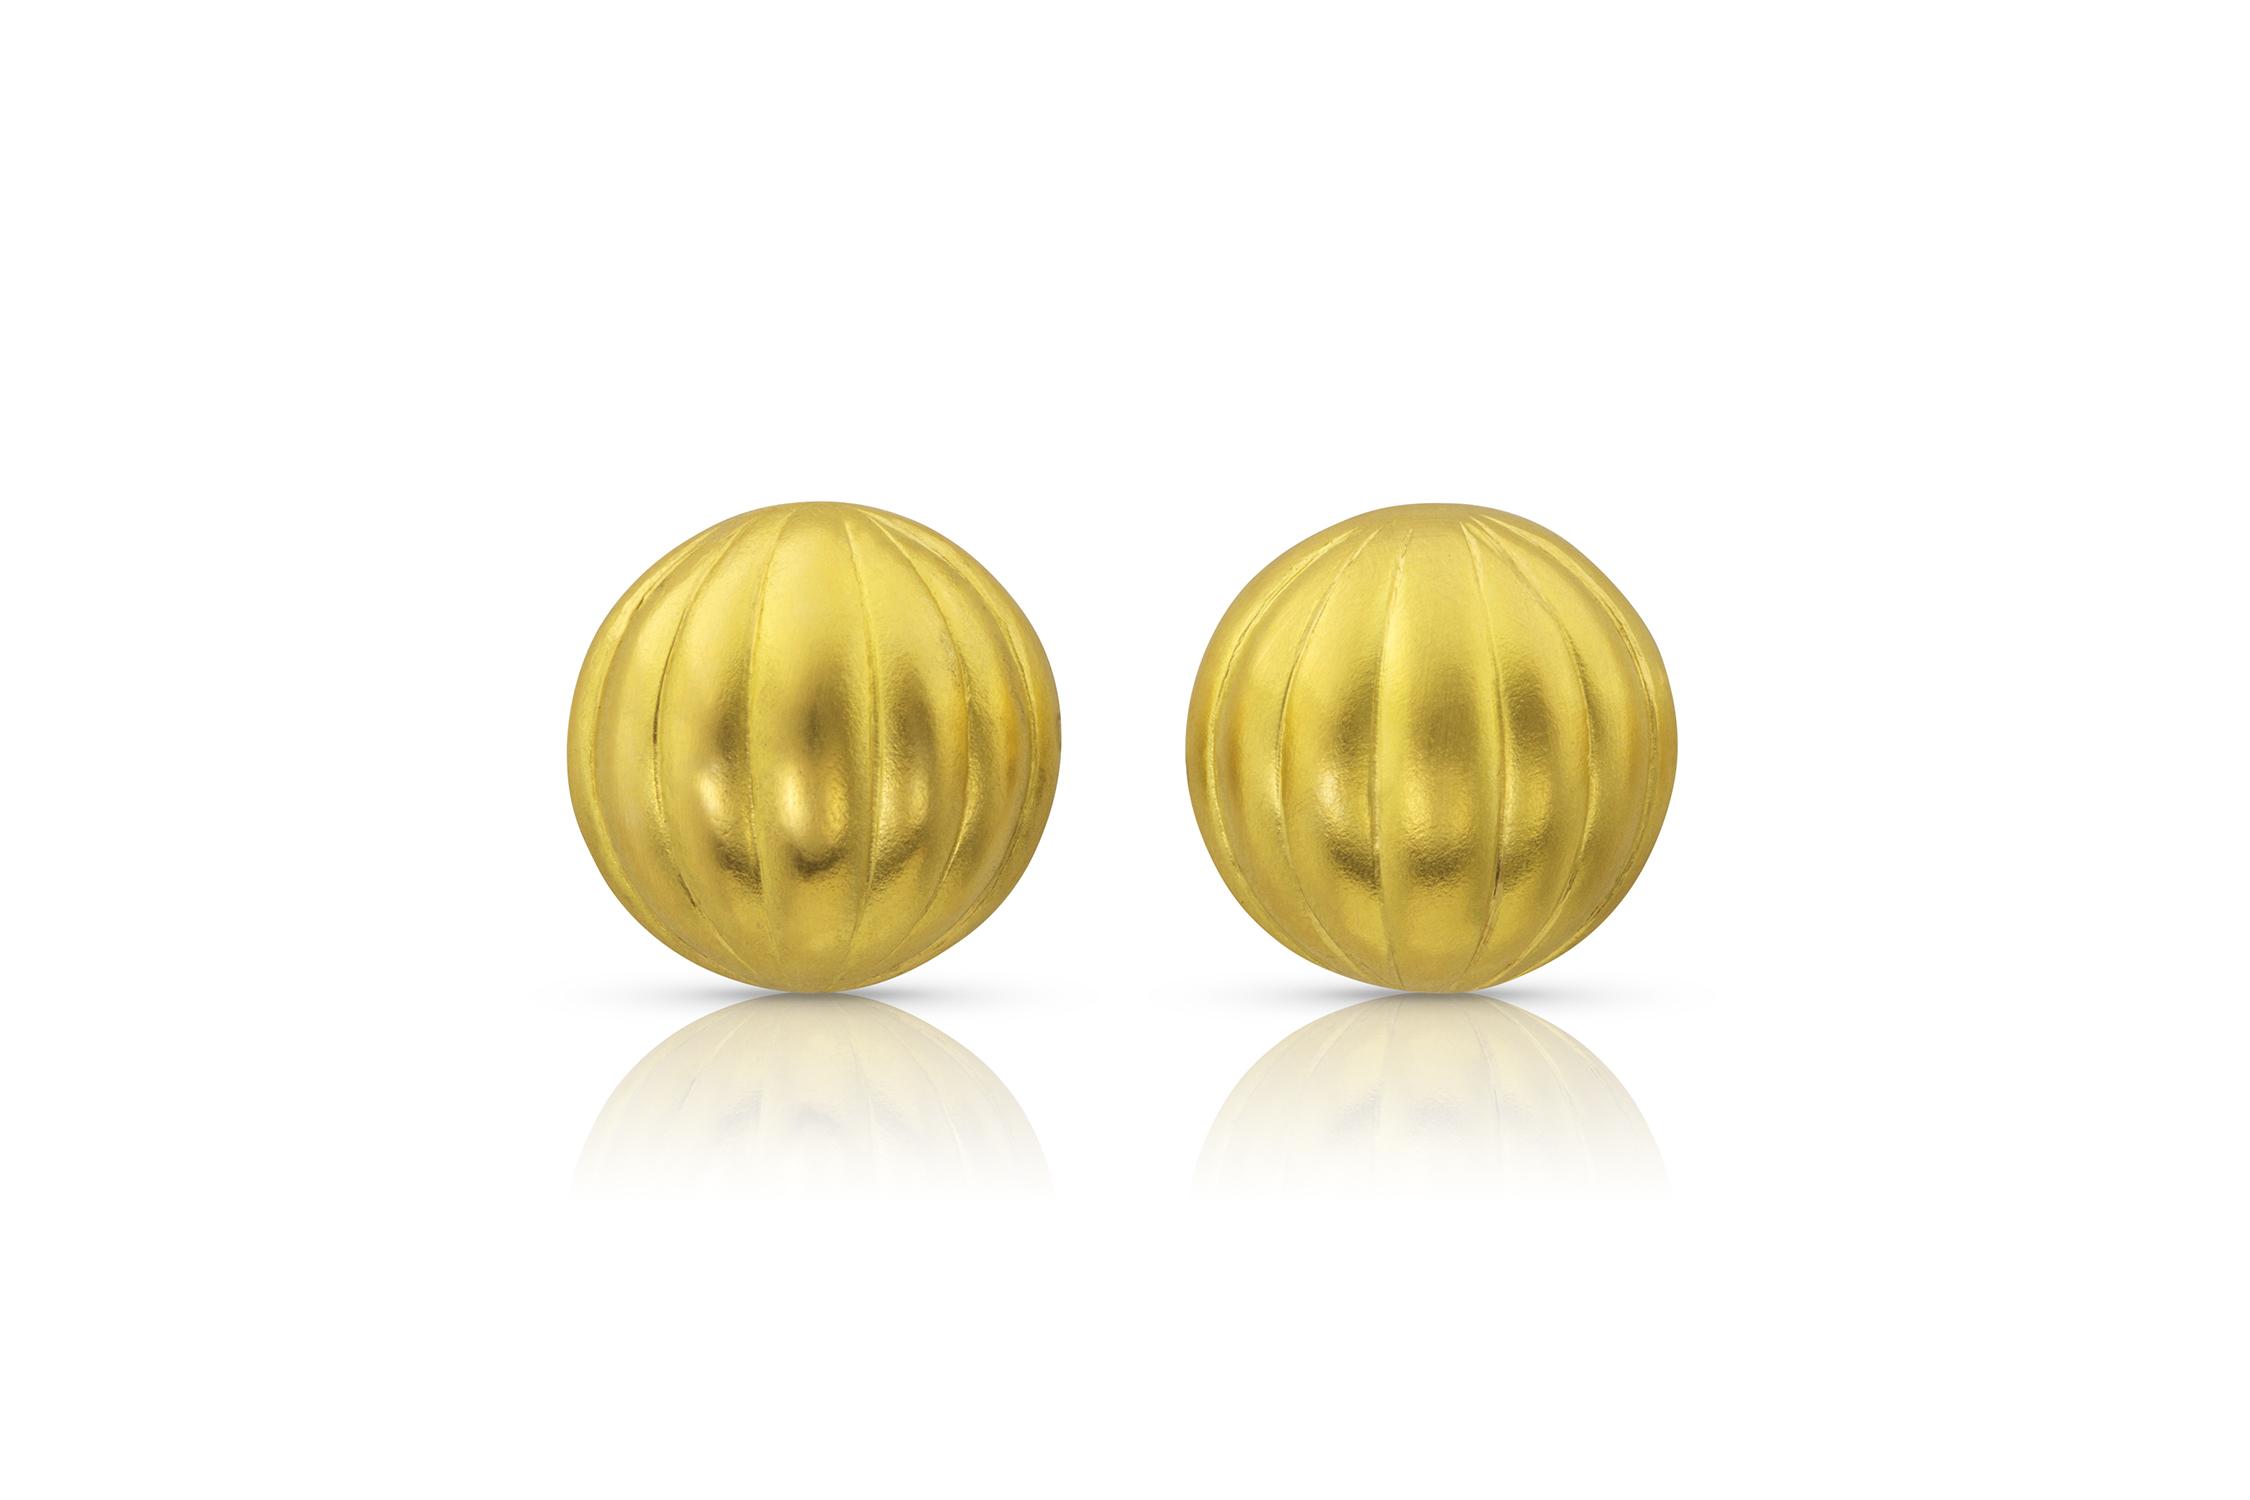 MELON POST 22k yellow gold